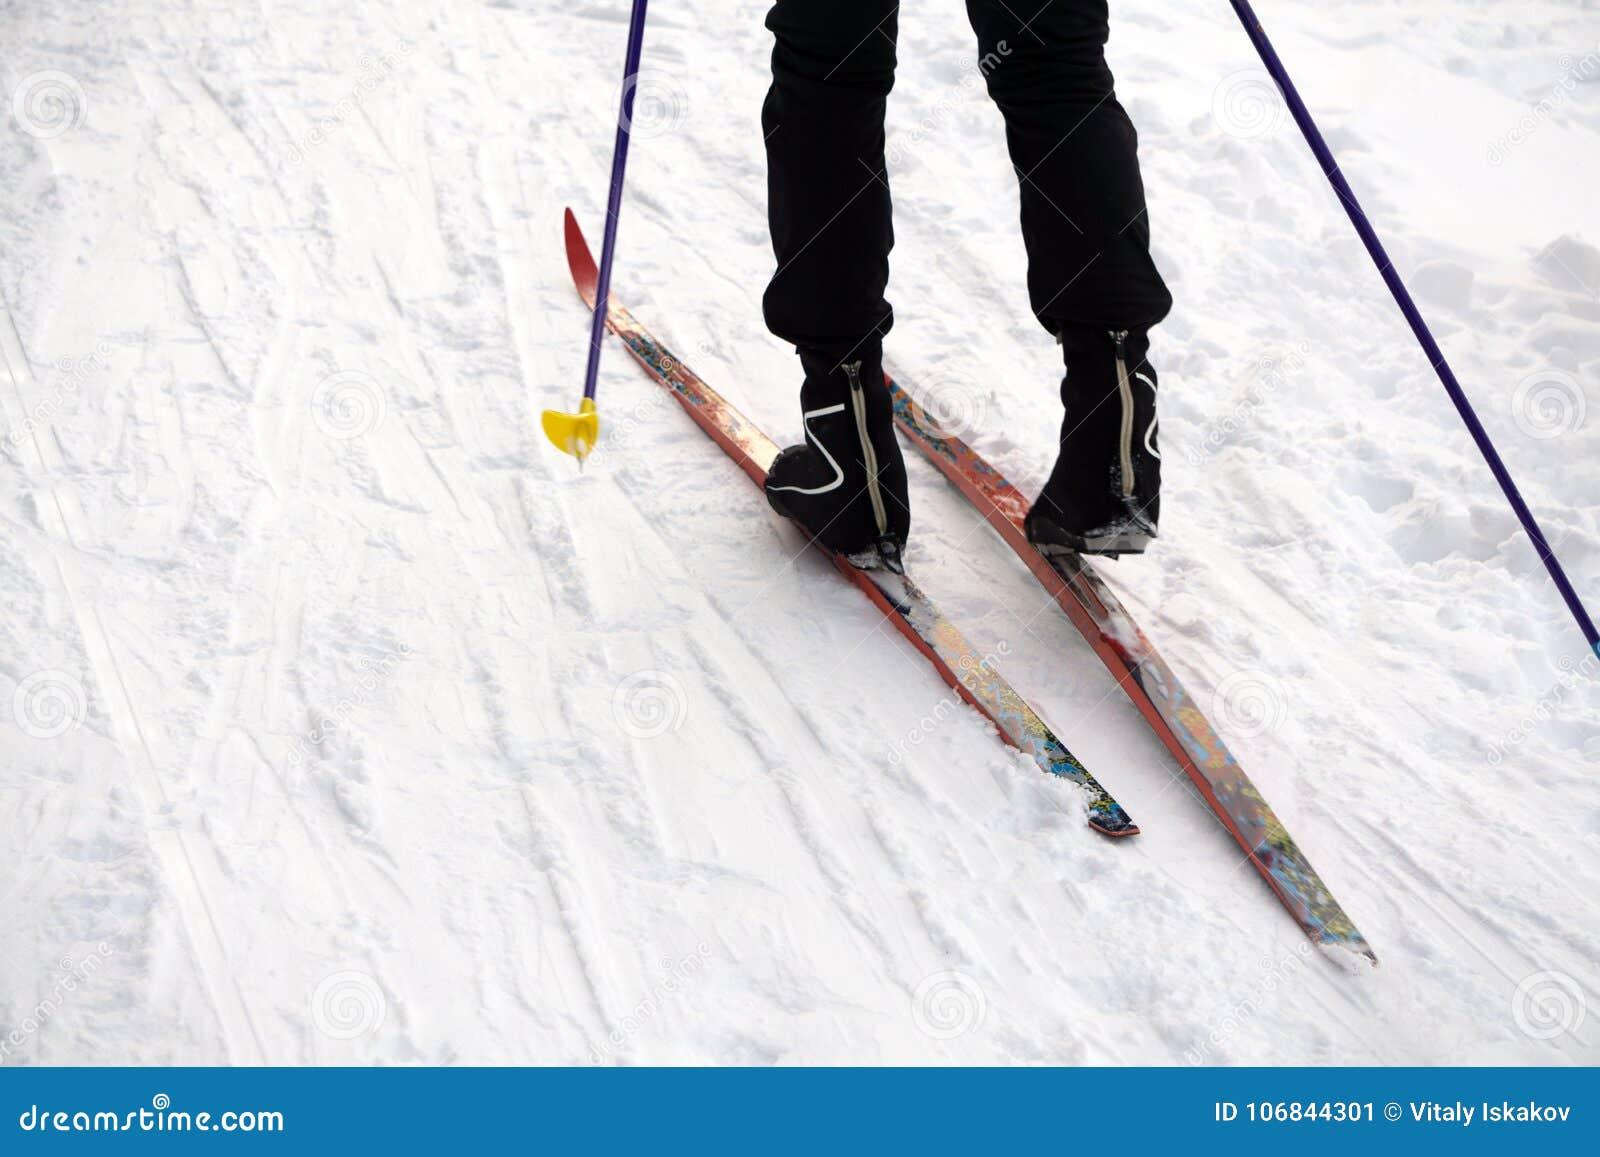 Ski slope, skier in winter forest background